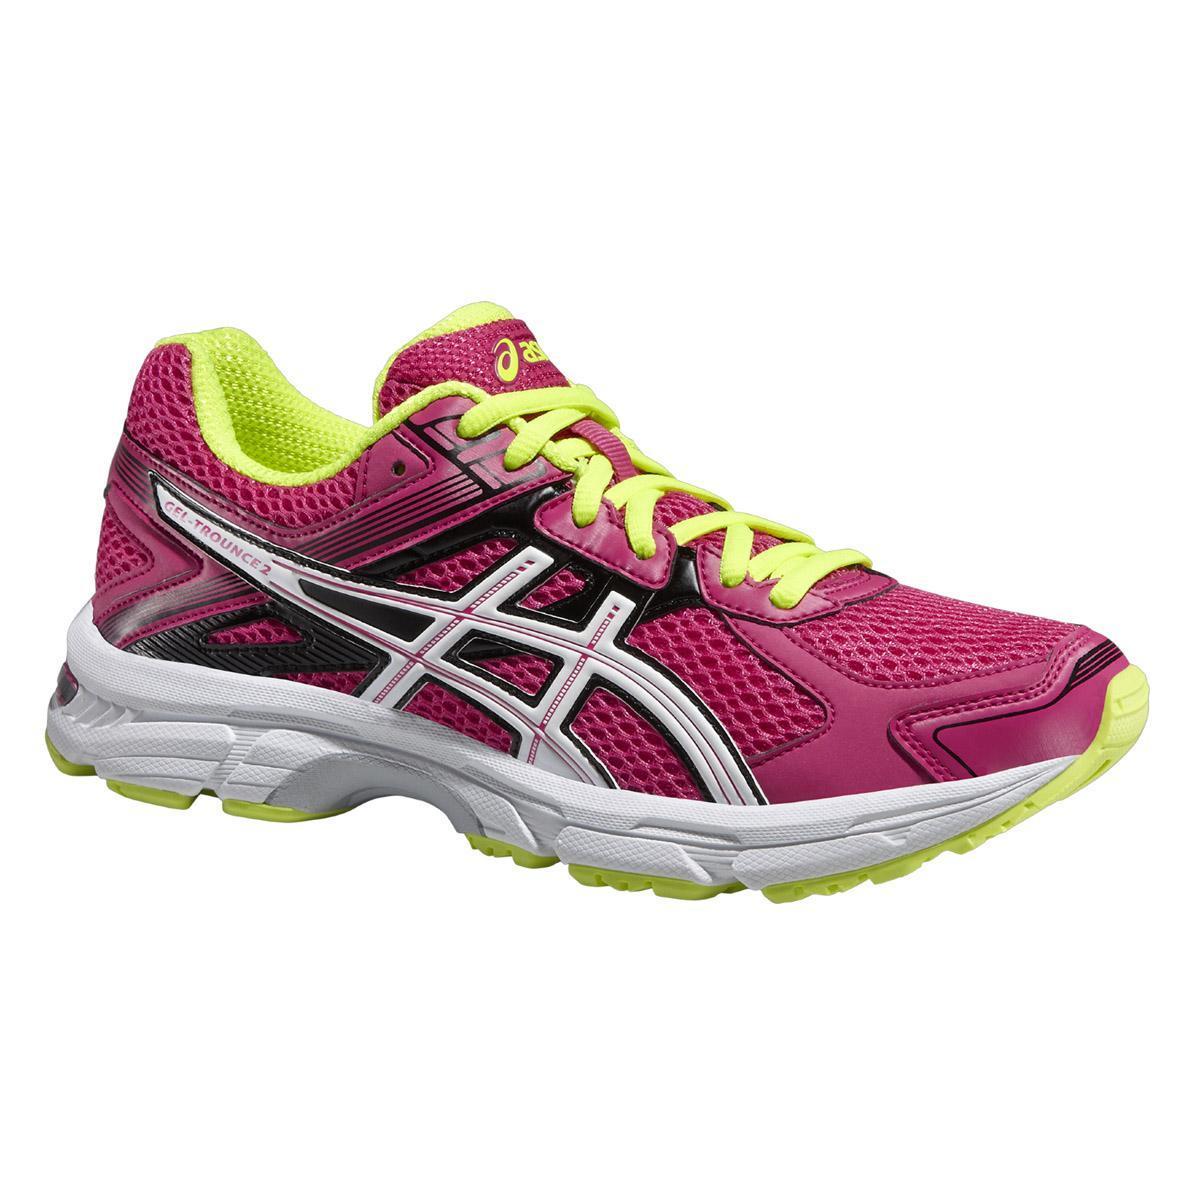 new style 40522 9933c Asics Womens GEL Trounce 2 Running Shoes - Hot Pink White Yellow -  Tennisnuts.com